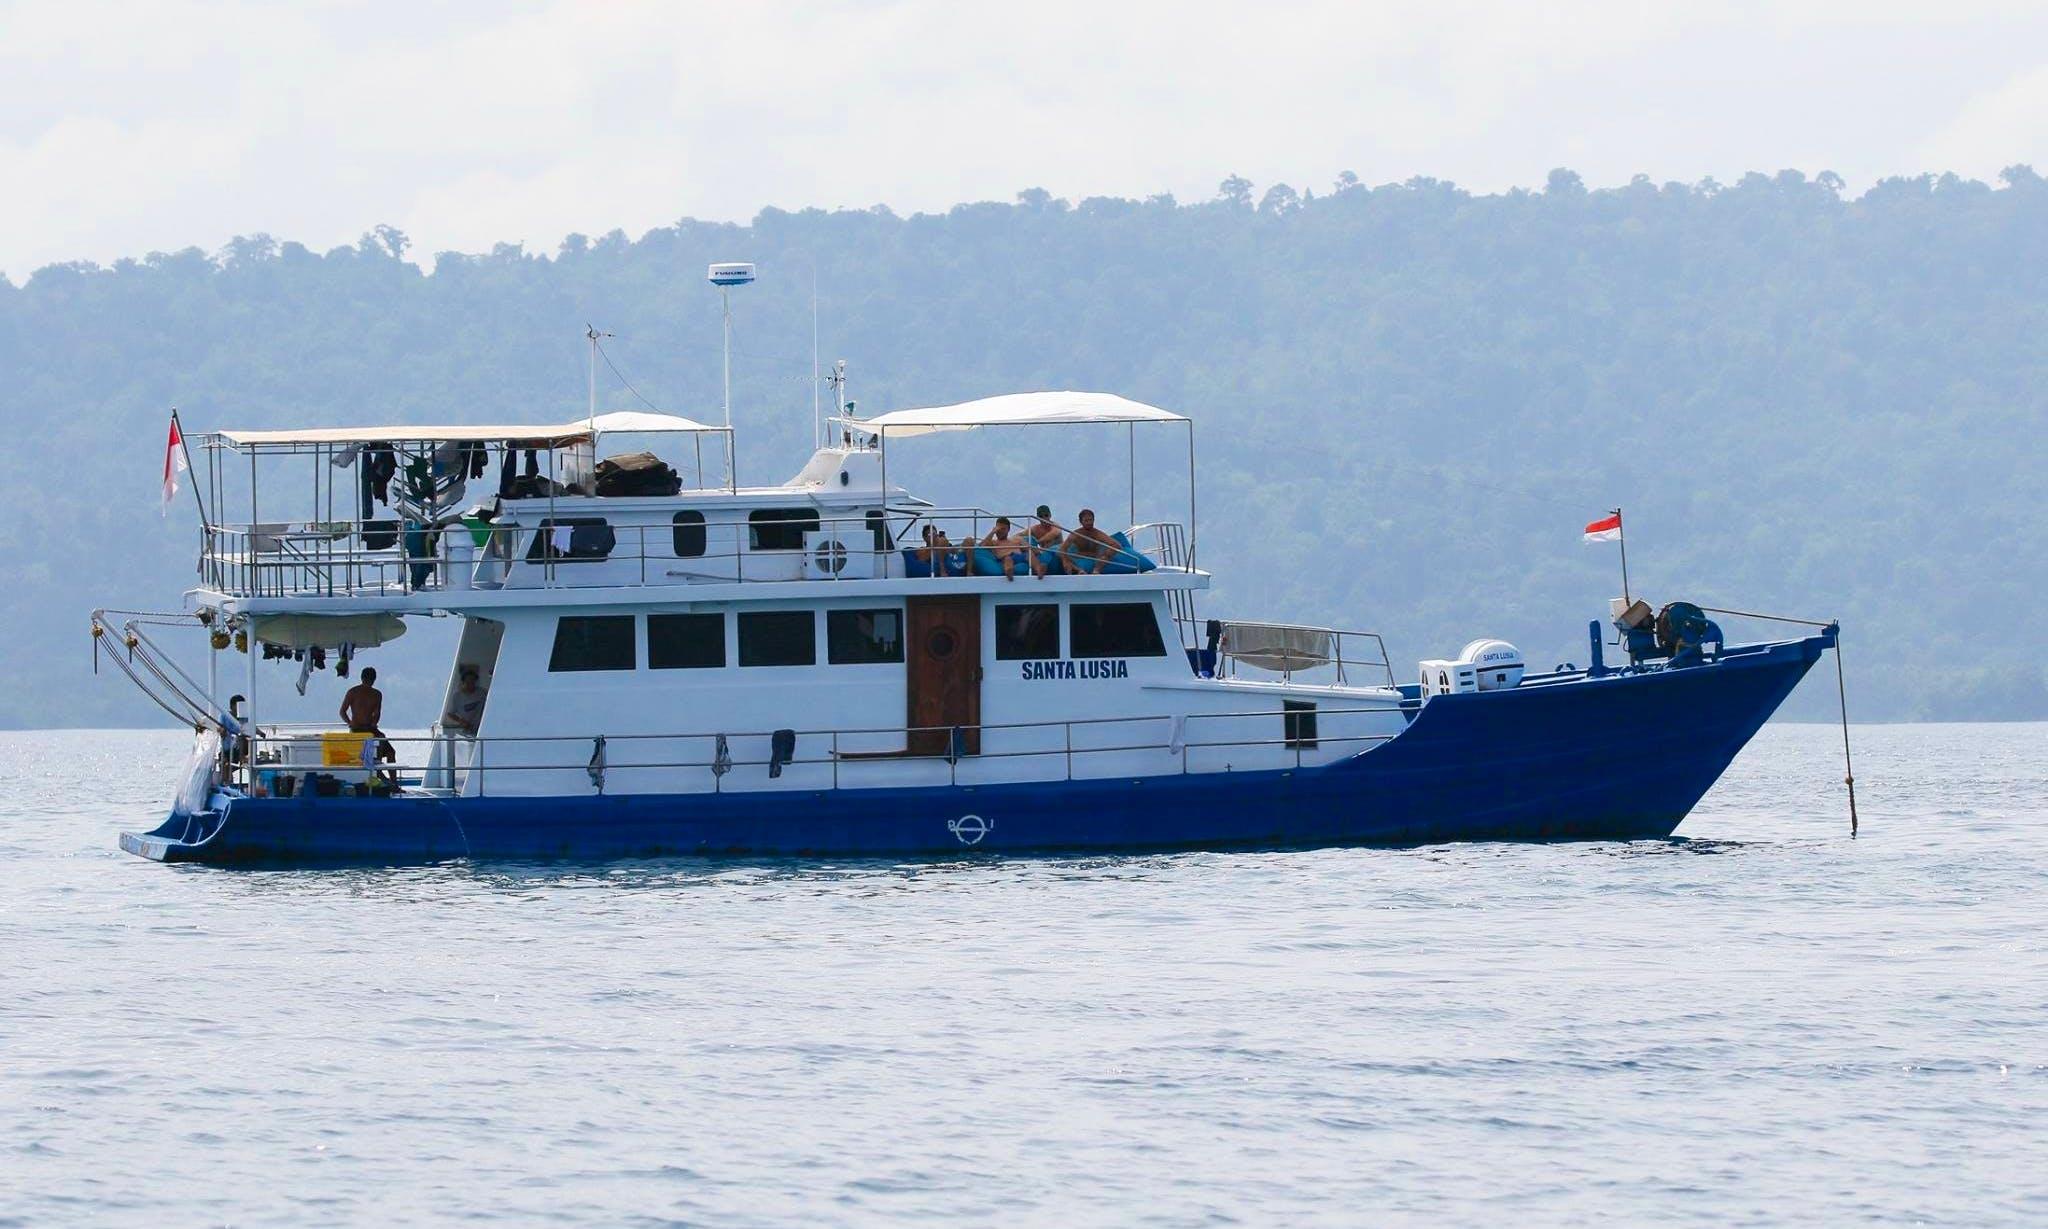 Enjoy Surf Charter in Padang, Indonesia on 65' Santa Lusia Power Mega Yacht